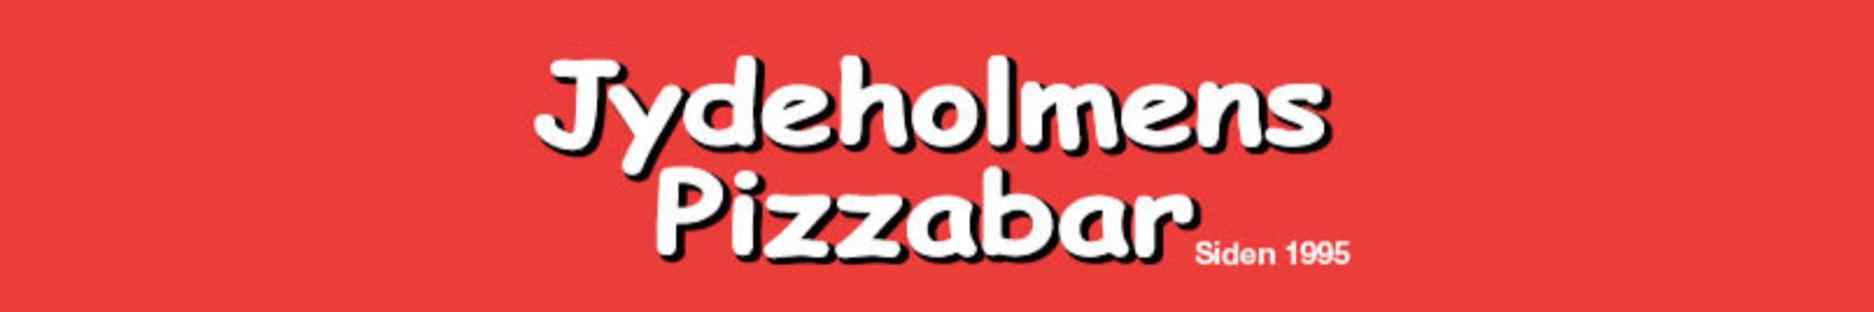 Jydeholmens Pizzabar - Vanløse logo